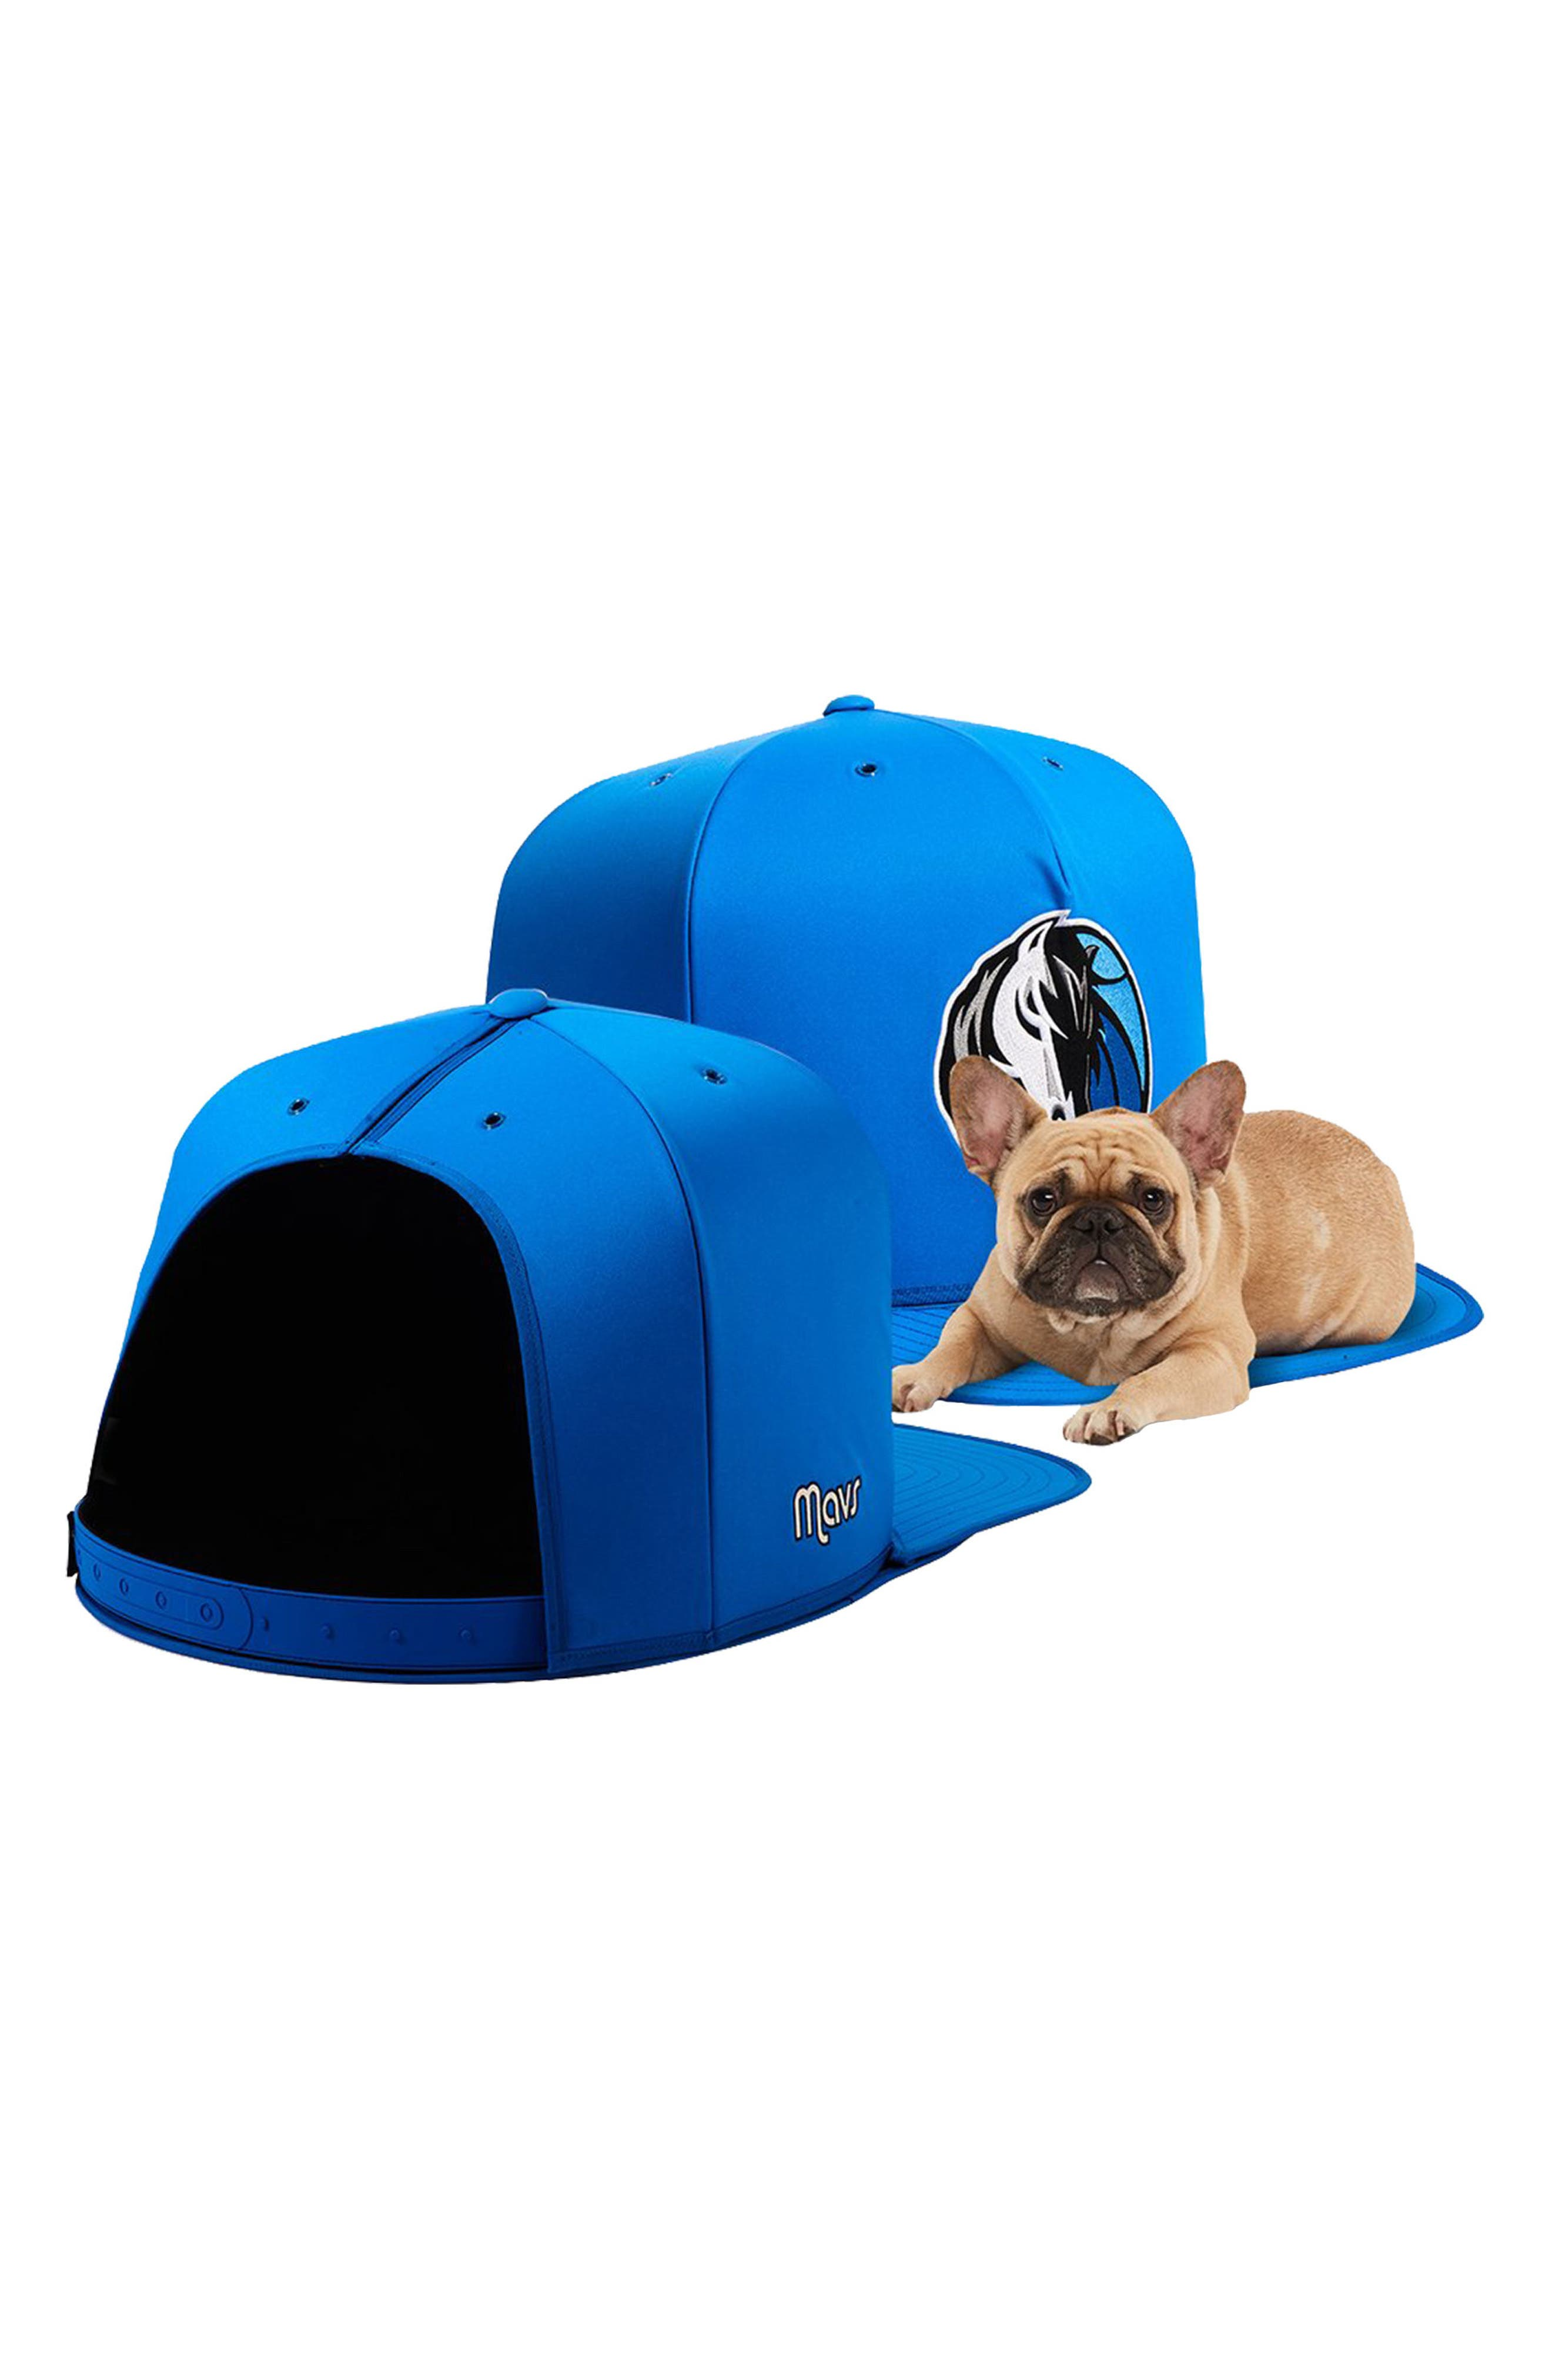 Dallas Mavericks Pet Bed,                             Alternate thumbnail 3, color,